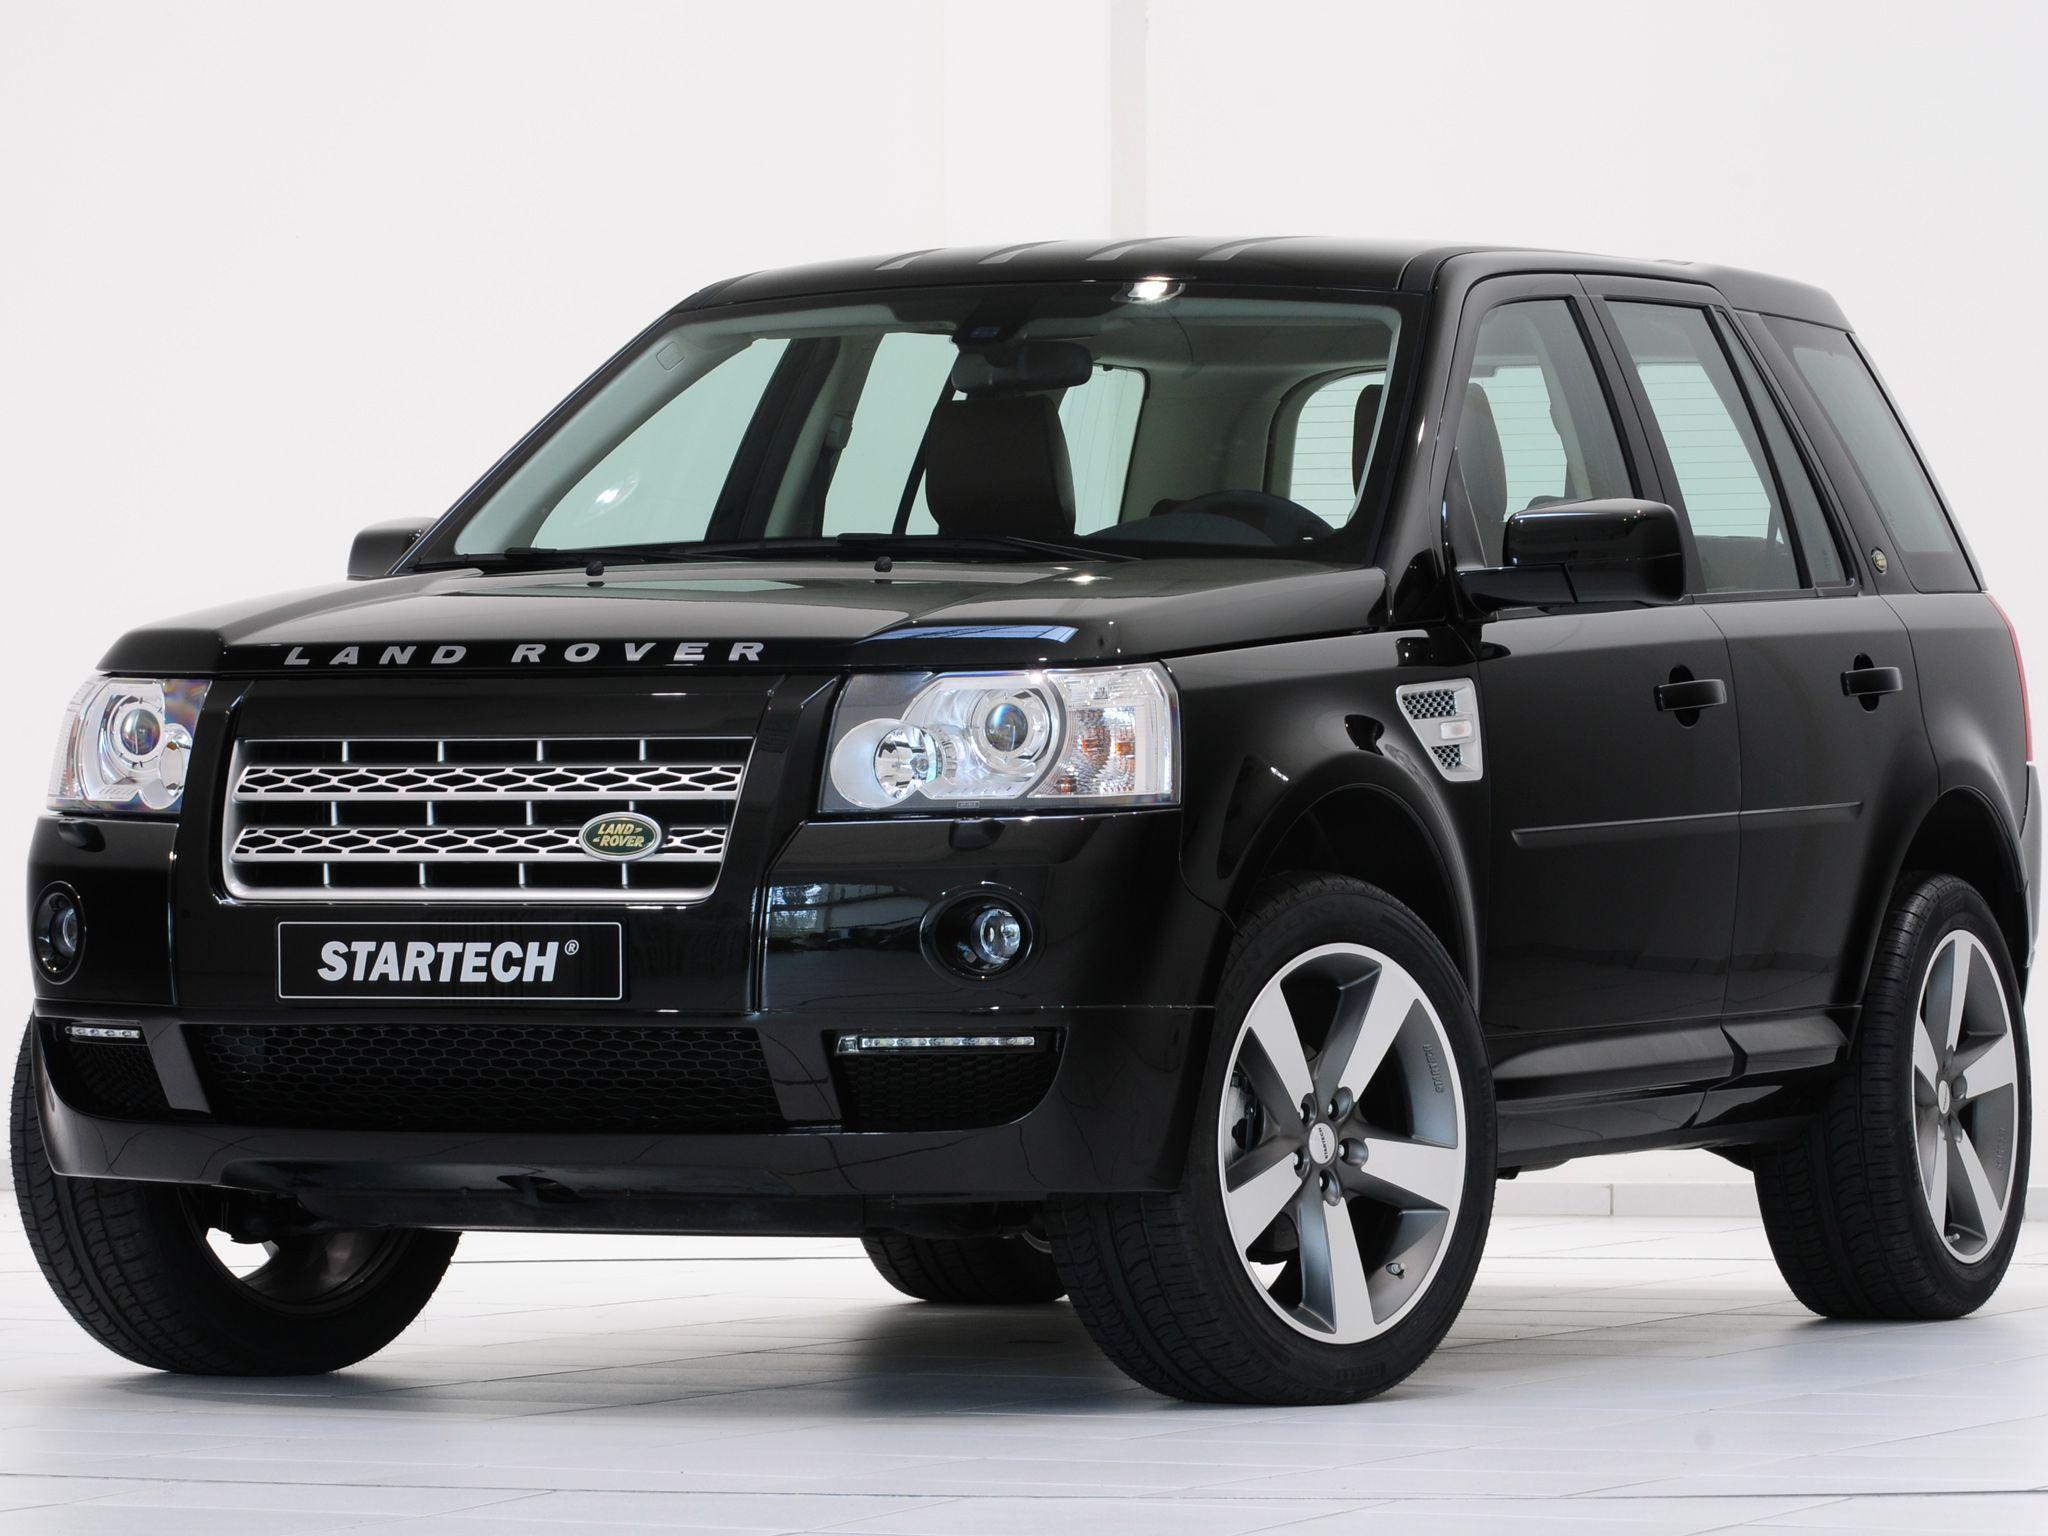 2009 Startech Land Rover Freelander